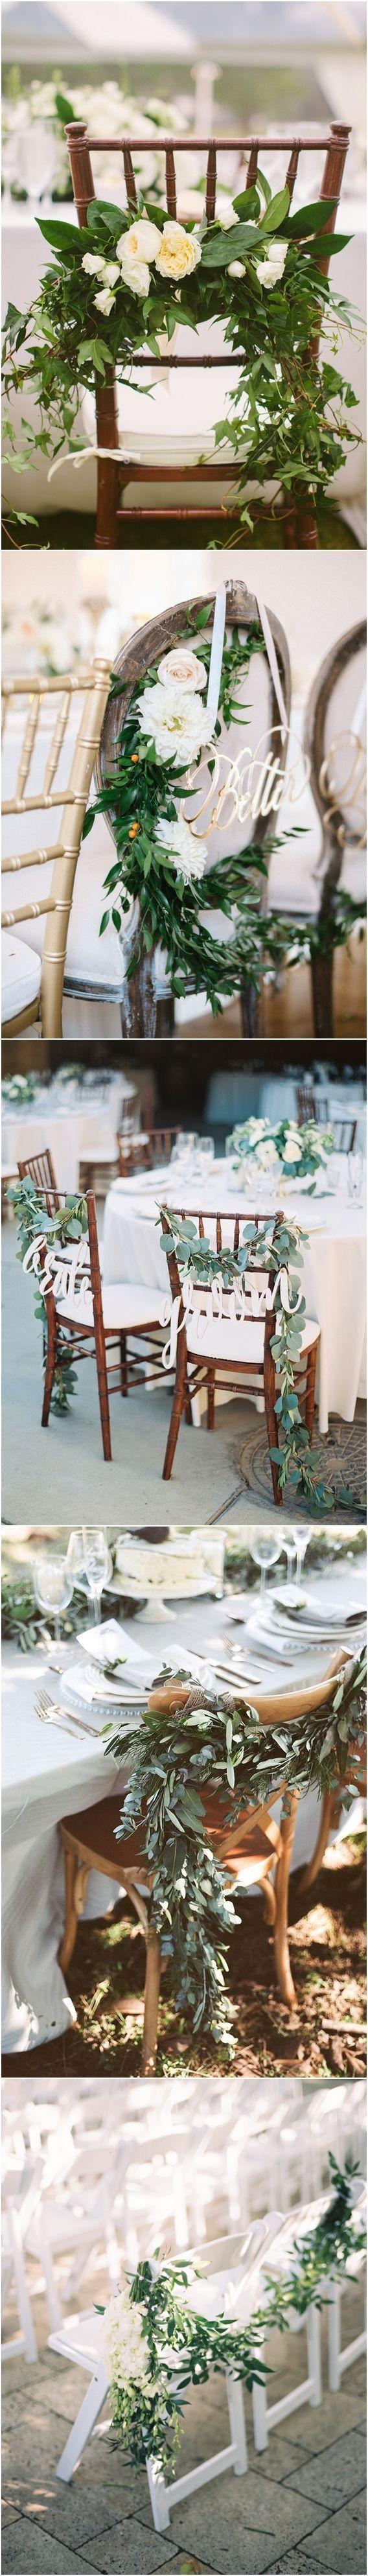 Greenery wedding chair decor ideas / http://www.deerpearlflowers.com/greenery-wedding-decor-ideas/ #weddingdecoration